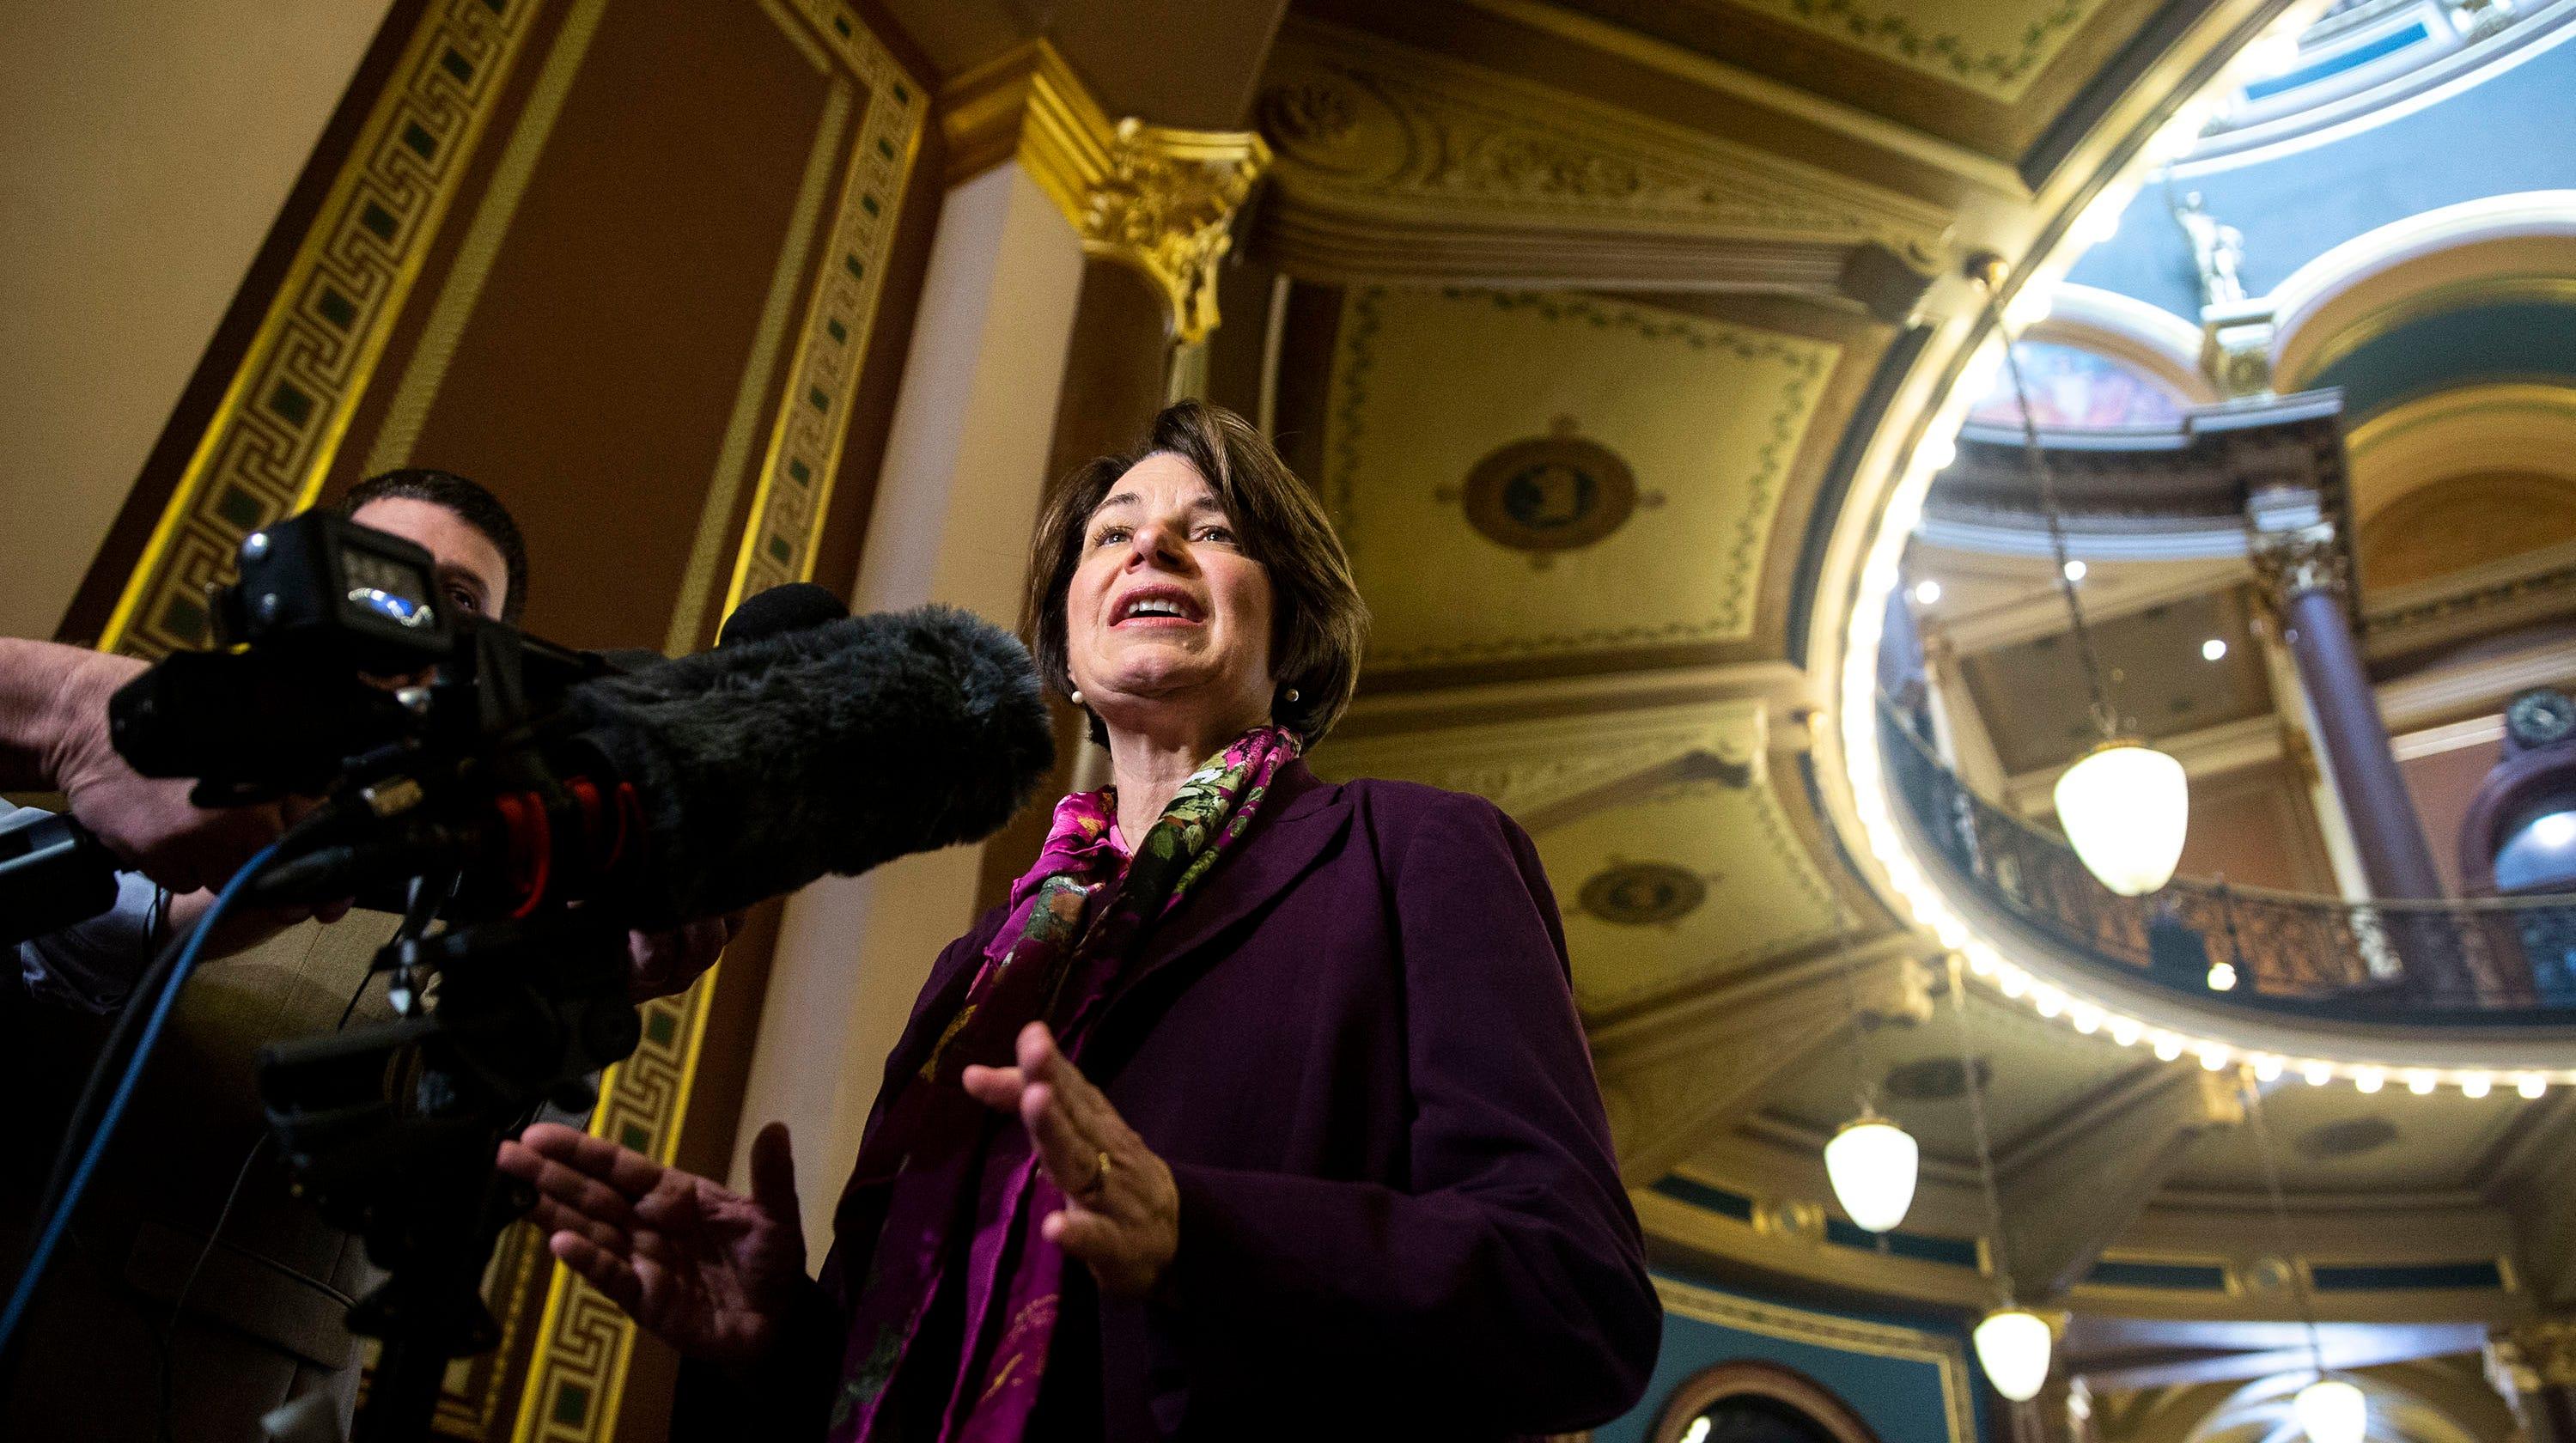 Photos: Amy Klobuchar visits the Iowa Capitol